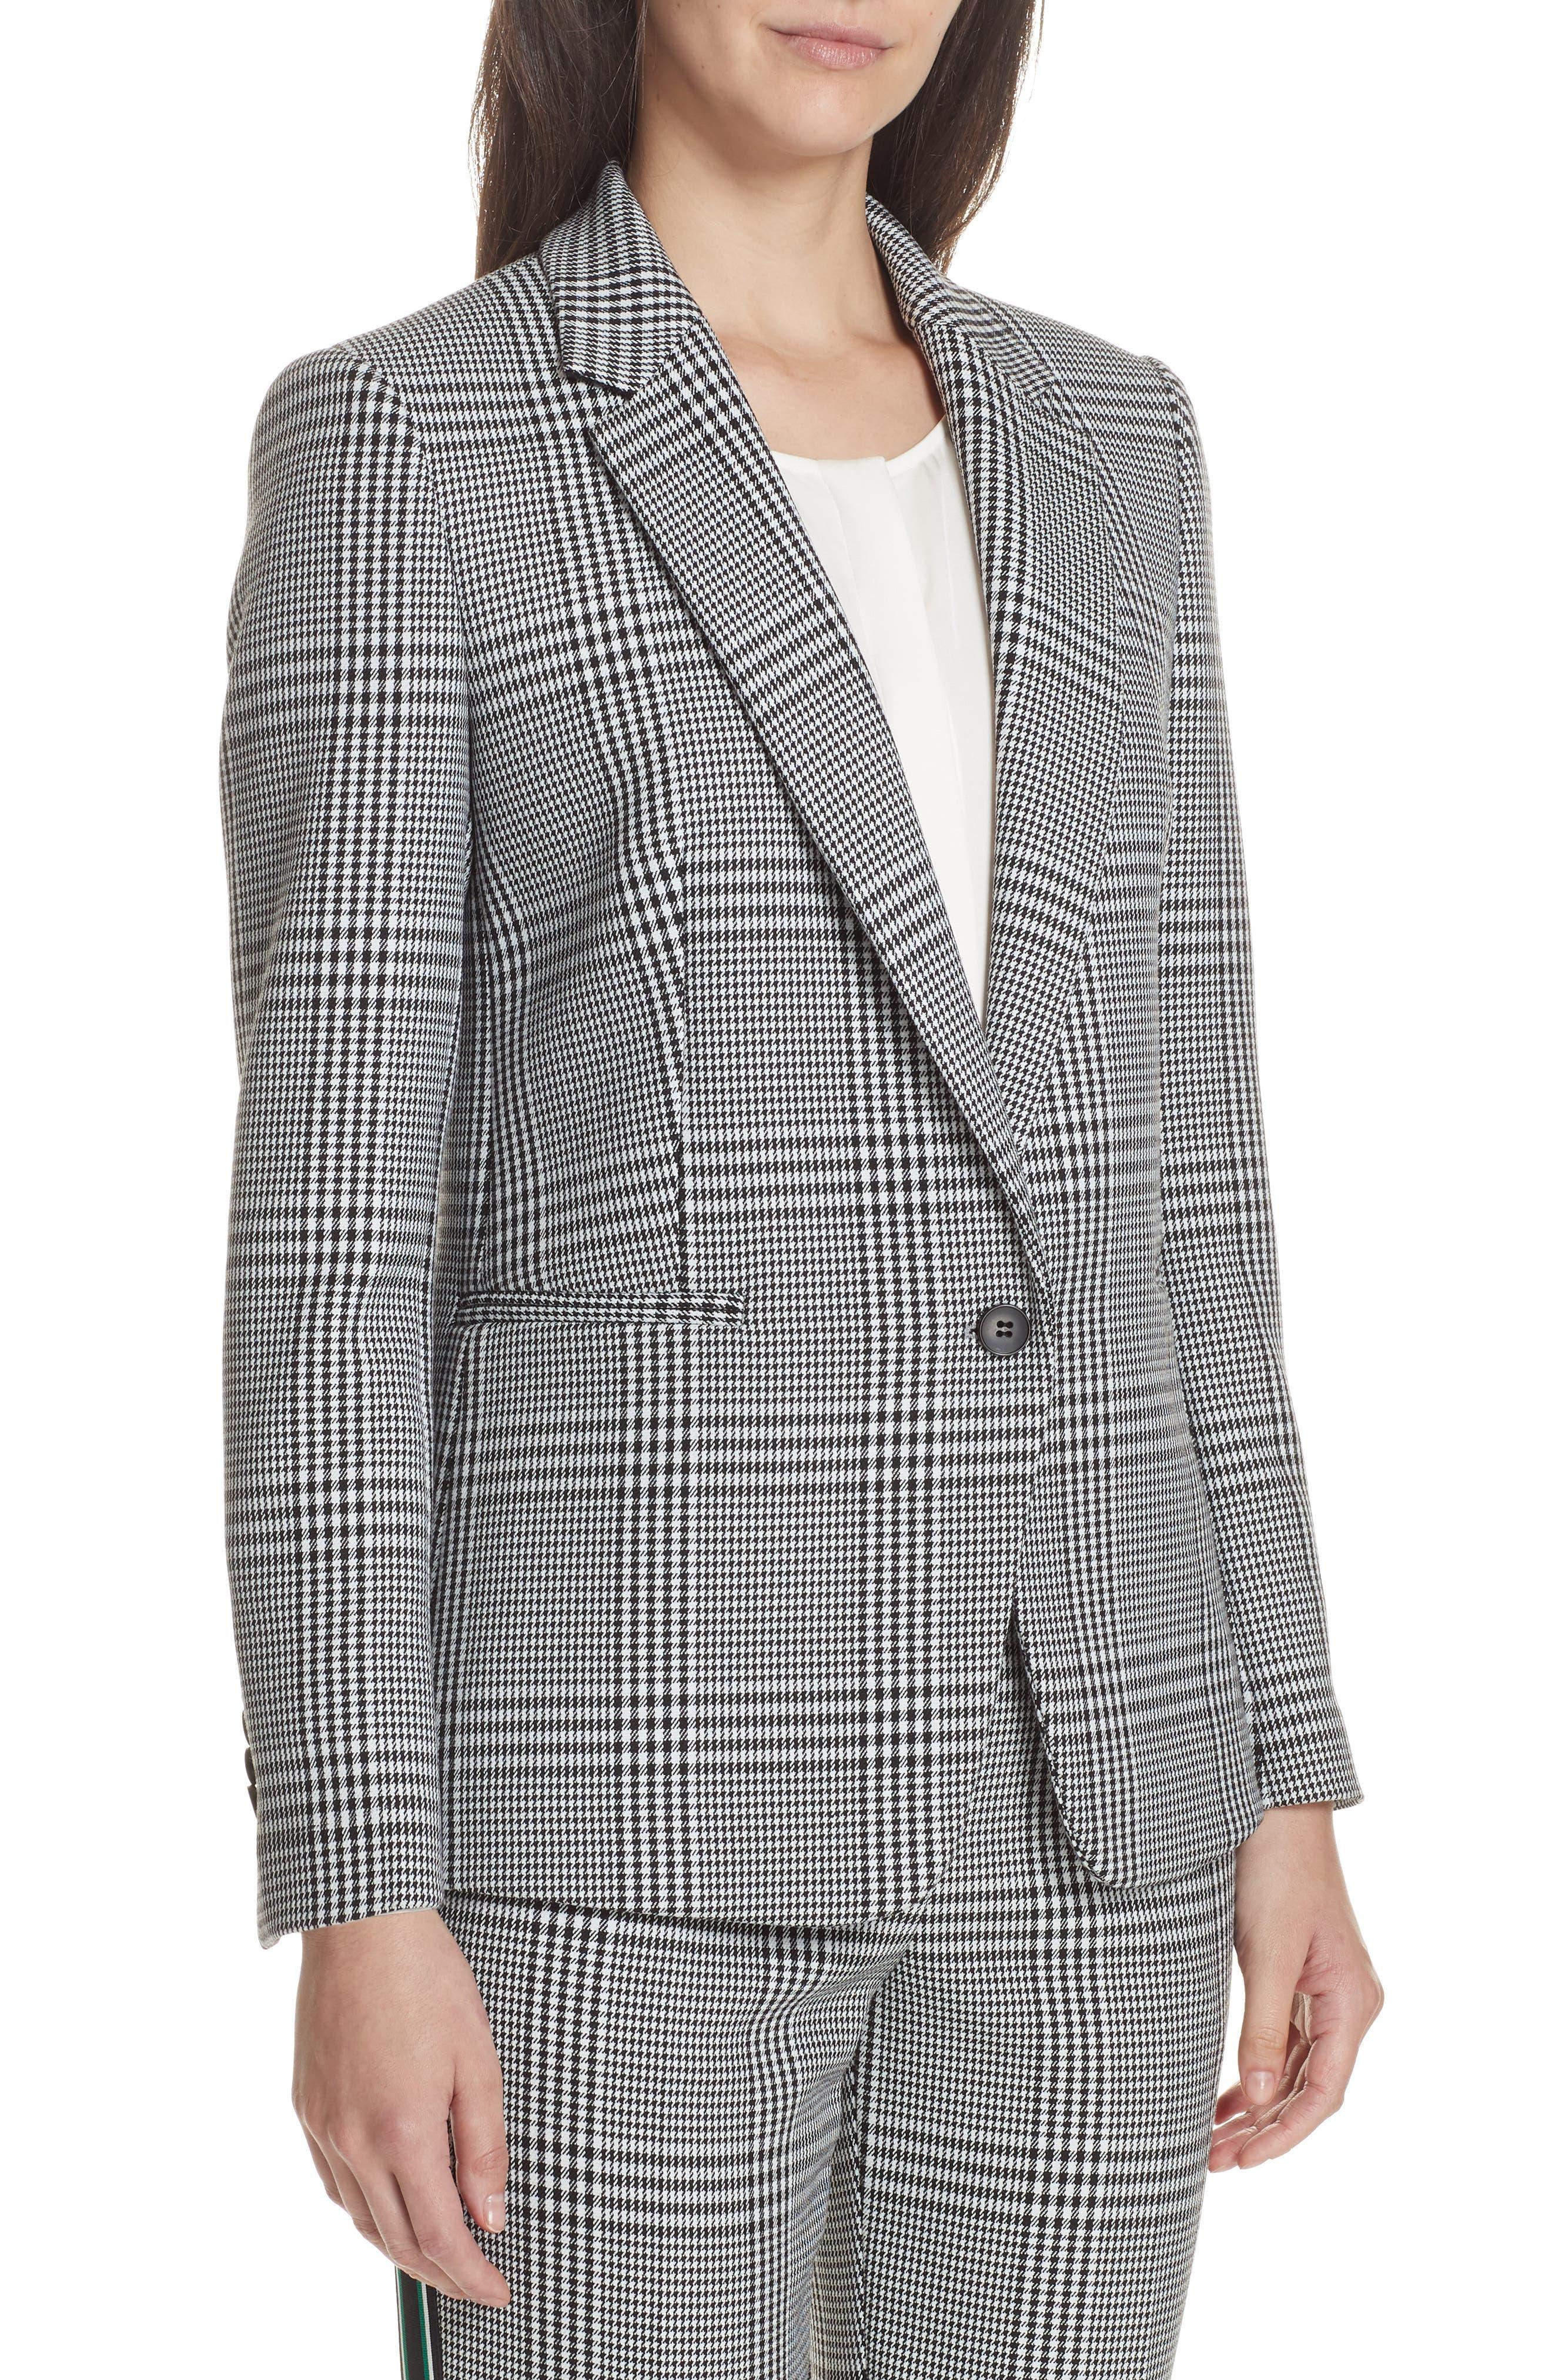 Jemaromina Glen Plaid Suit Jacket,                             Alternate thumbnail 4, color,                             020